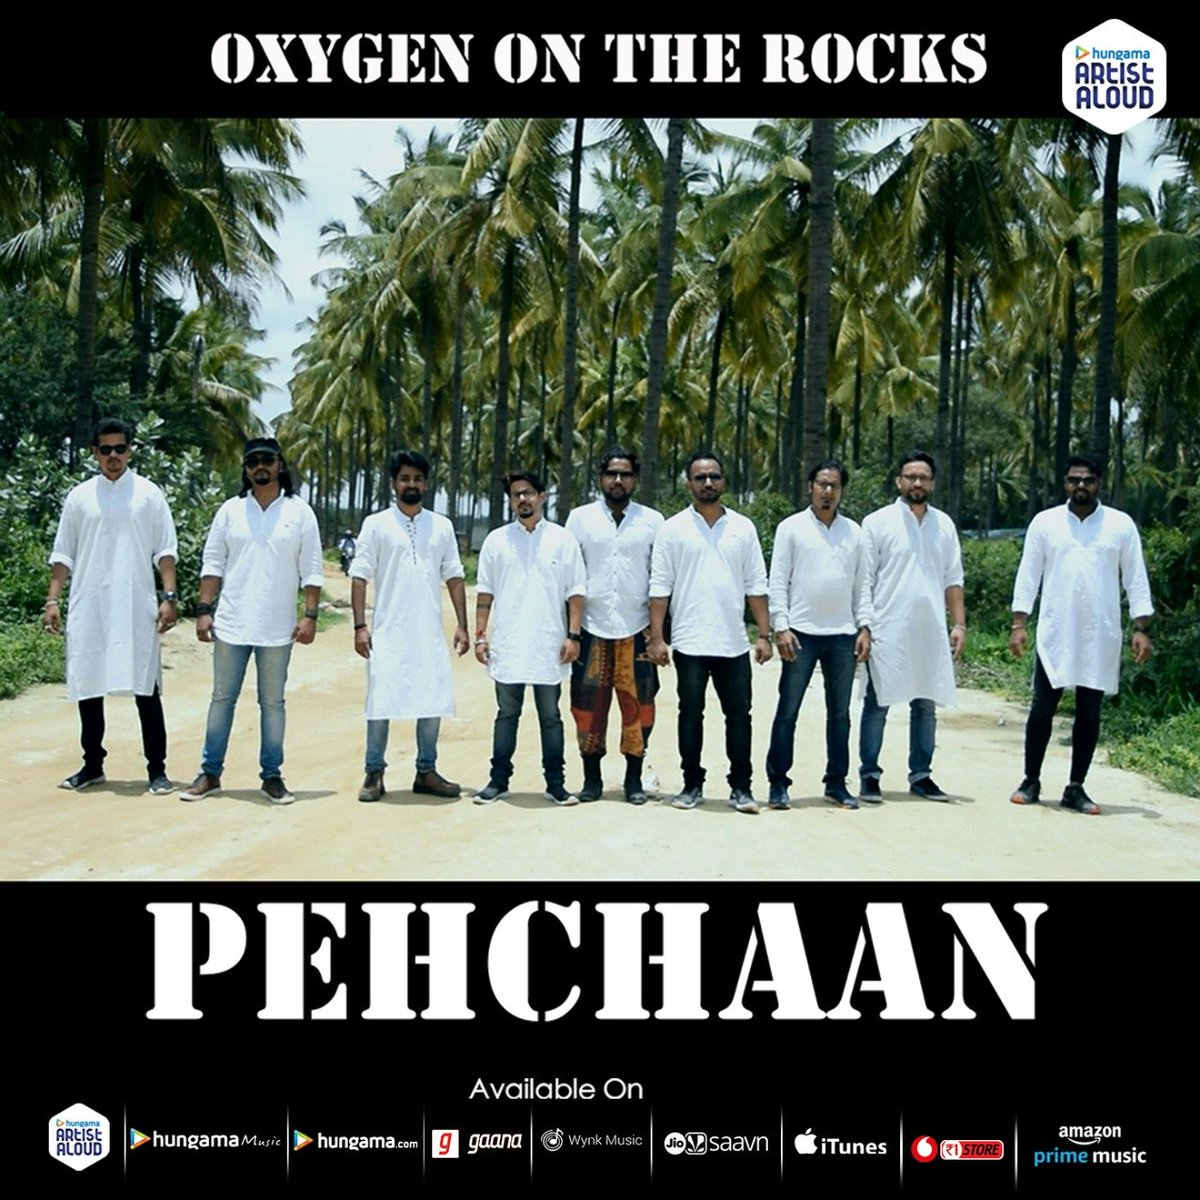 pehchaan hashtag on Twitter